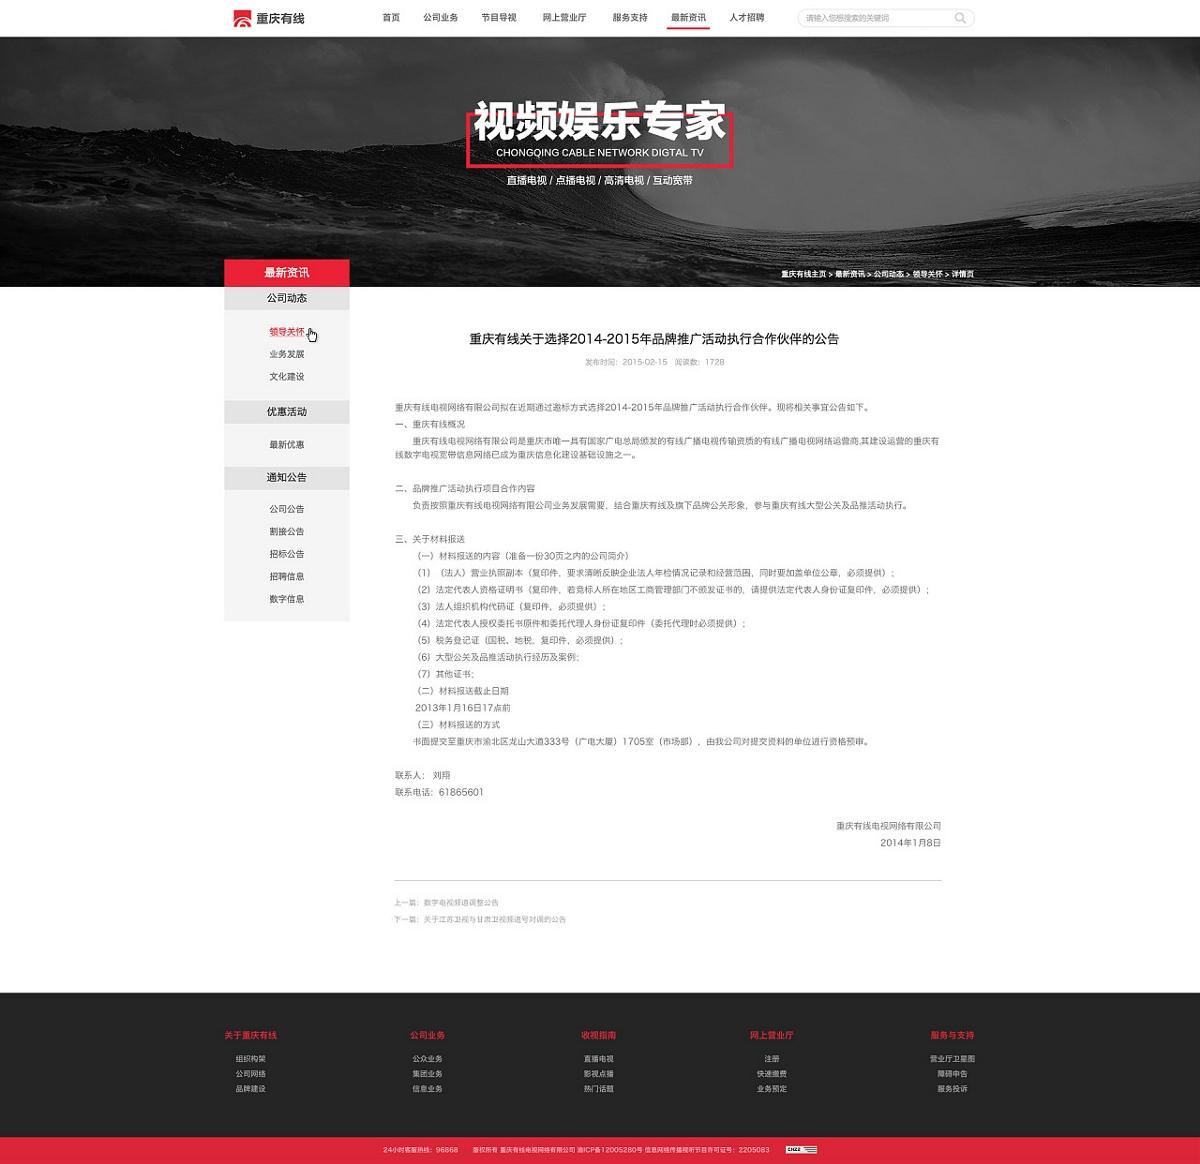 CCN重庆有线集团官网+营业厅形象设计